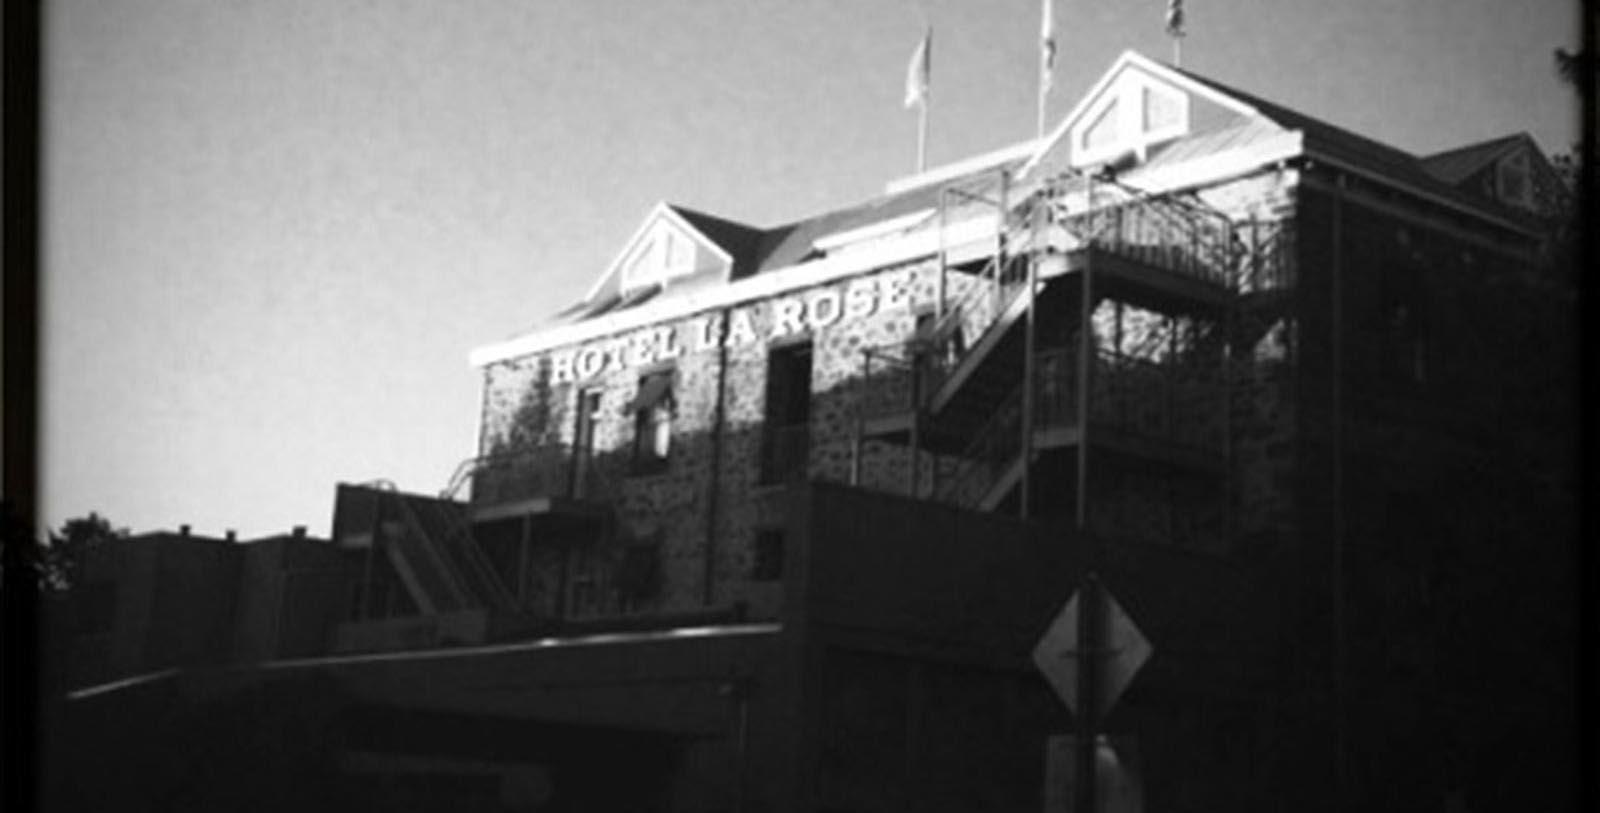 Image of Historic Exterior, Hotel La Rose in Santa Rosa, California, 1907, Member of Historic Hotels of America, Discover